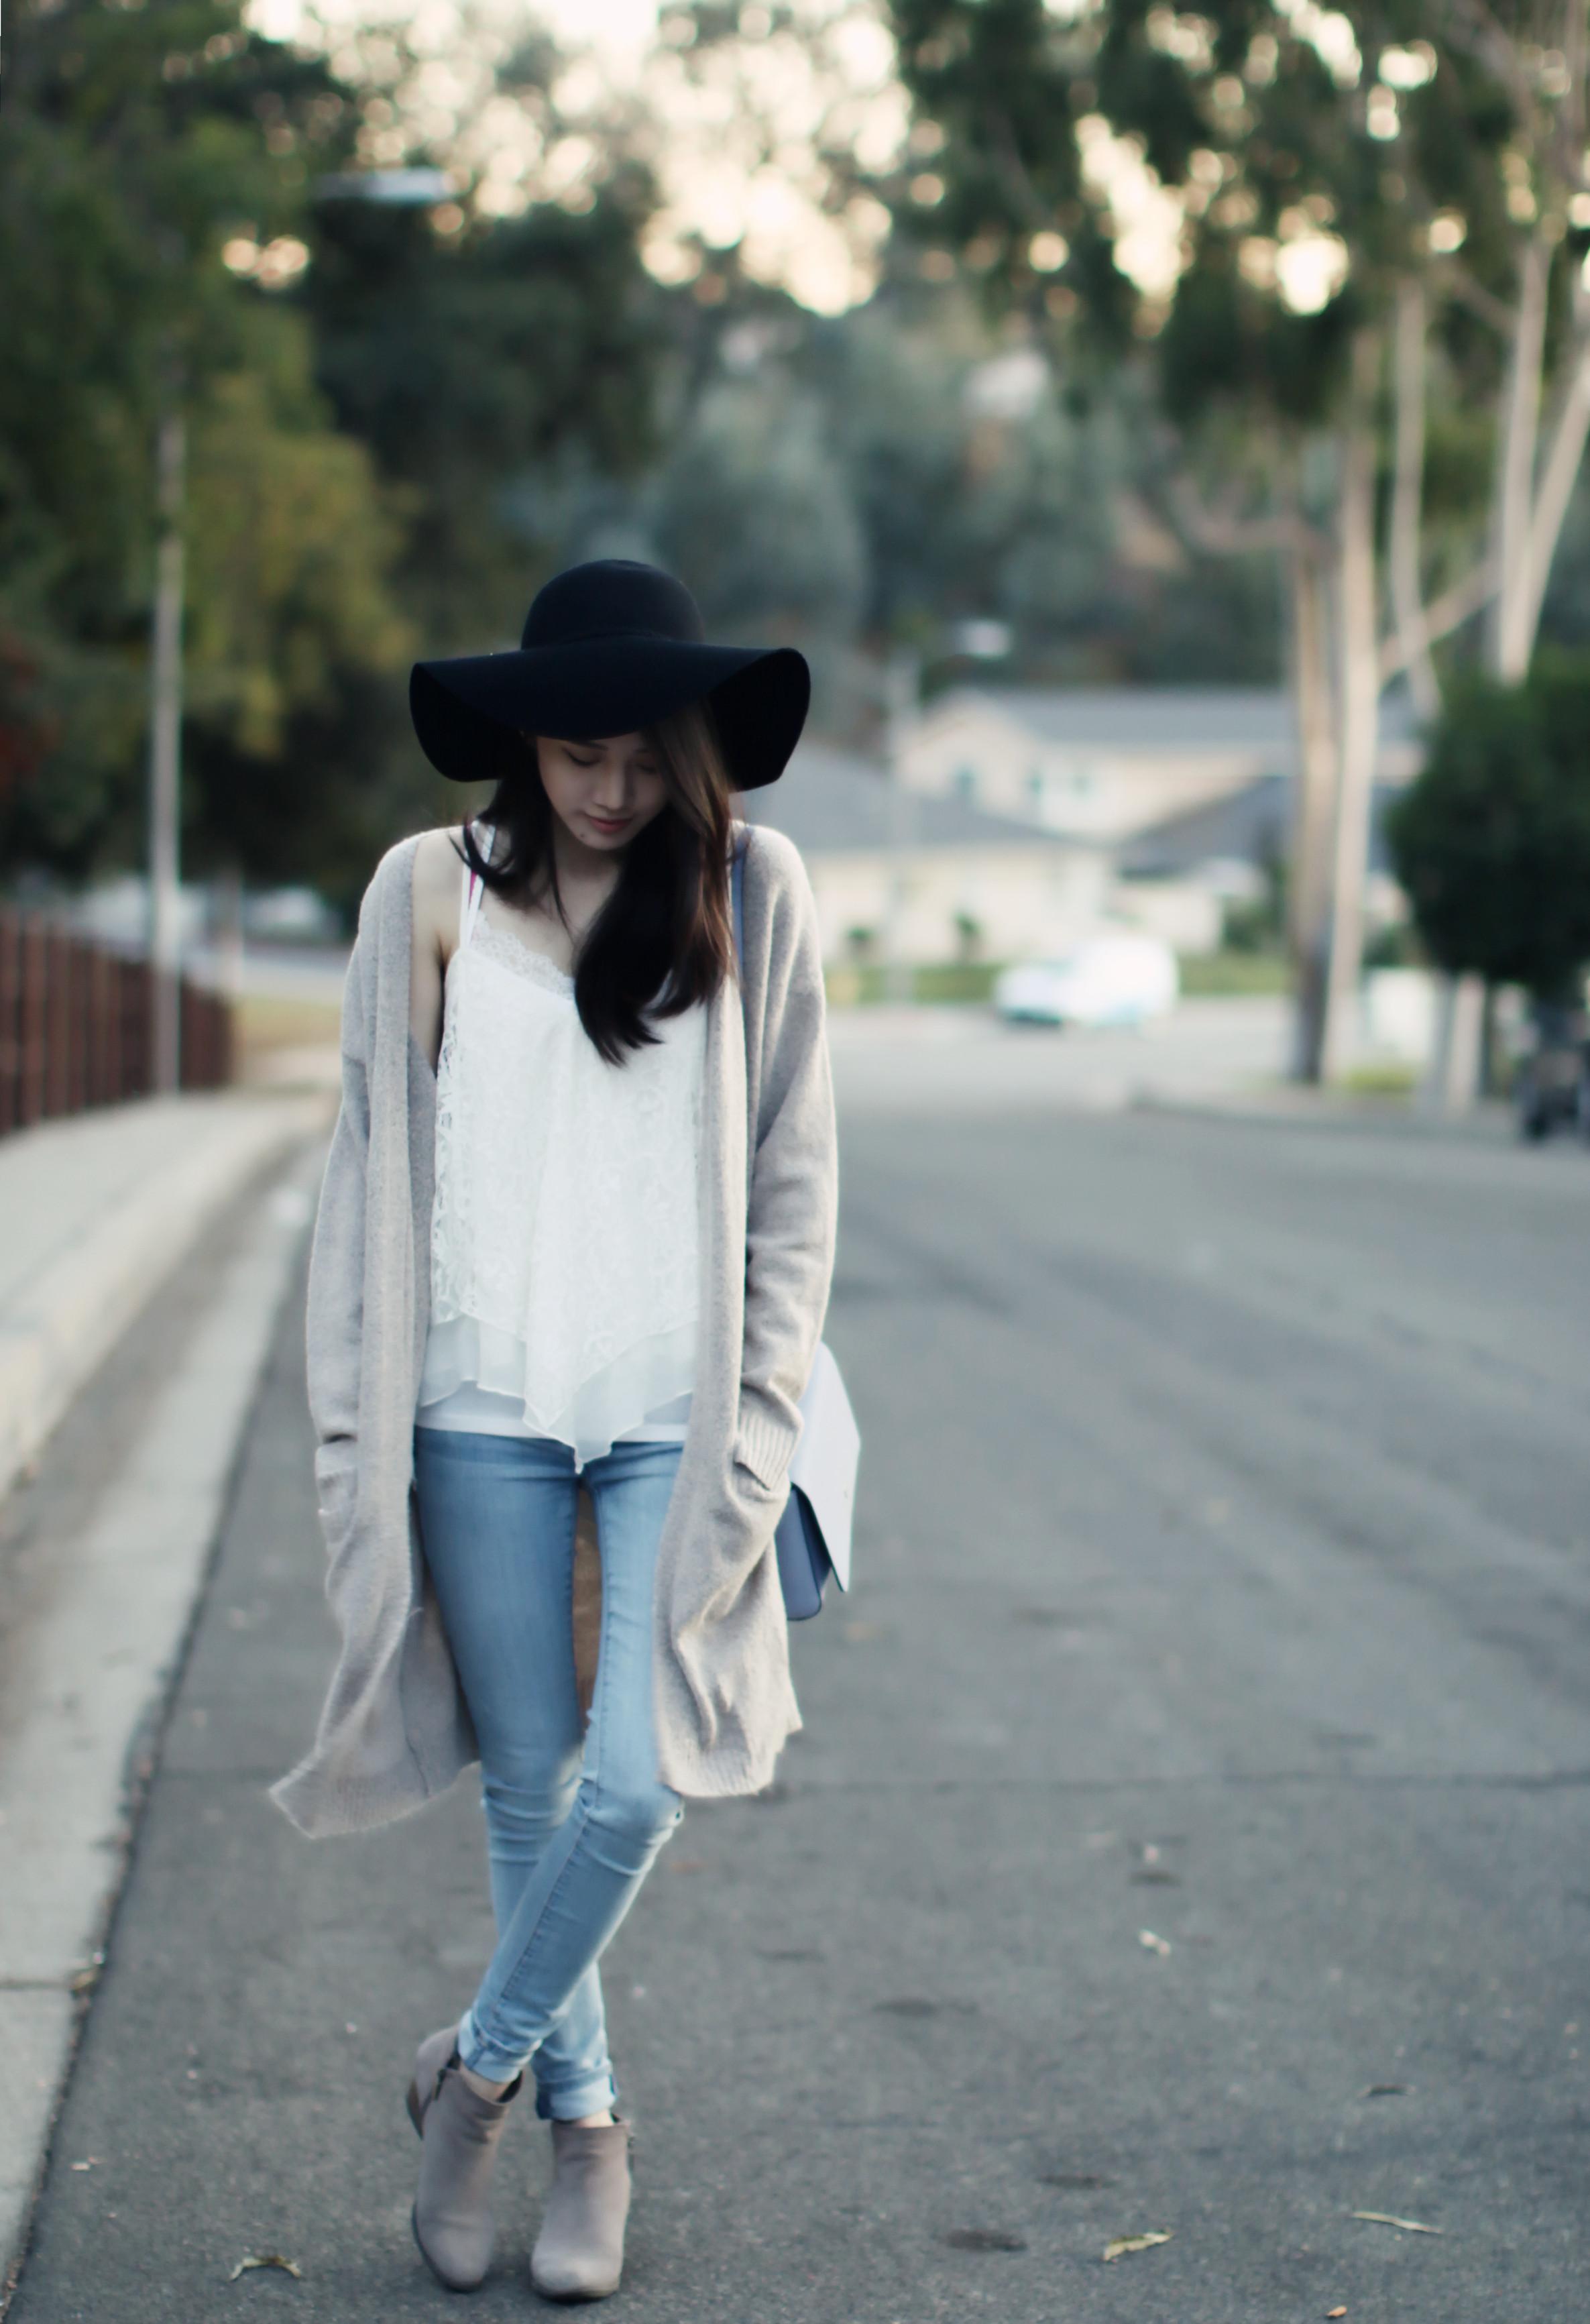 3848-ootd-fashion-style-outfitoftheday-wiwt-nordstrom-abercrombie-bohemian-fallfashion-forever21-f21-f21xme-koreanfashion-elizabeeetht-clothestoyouuu